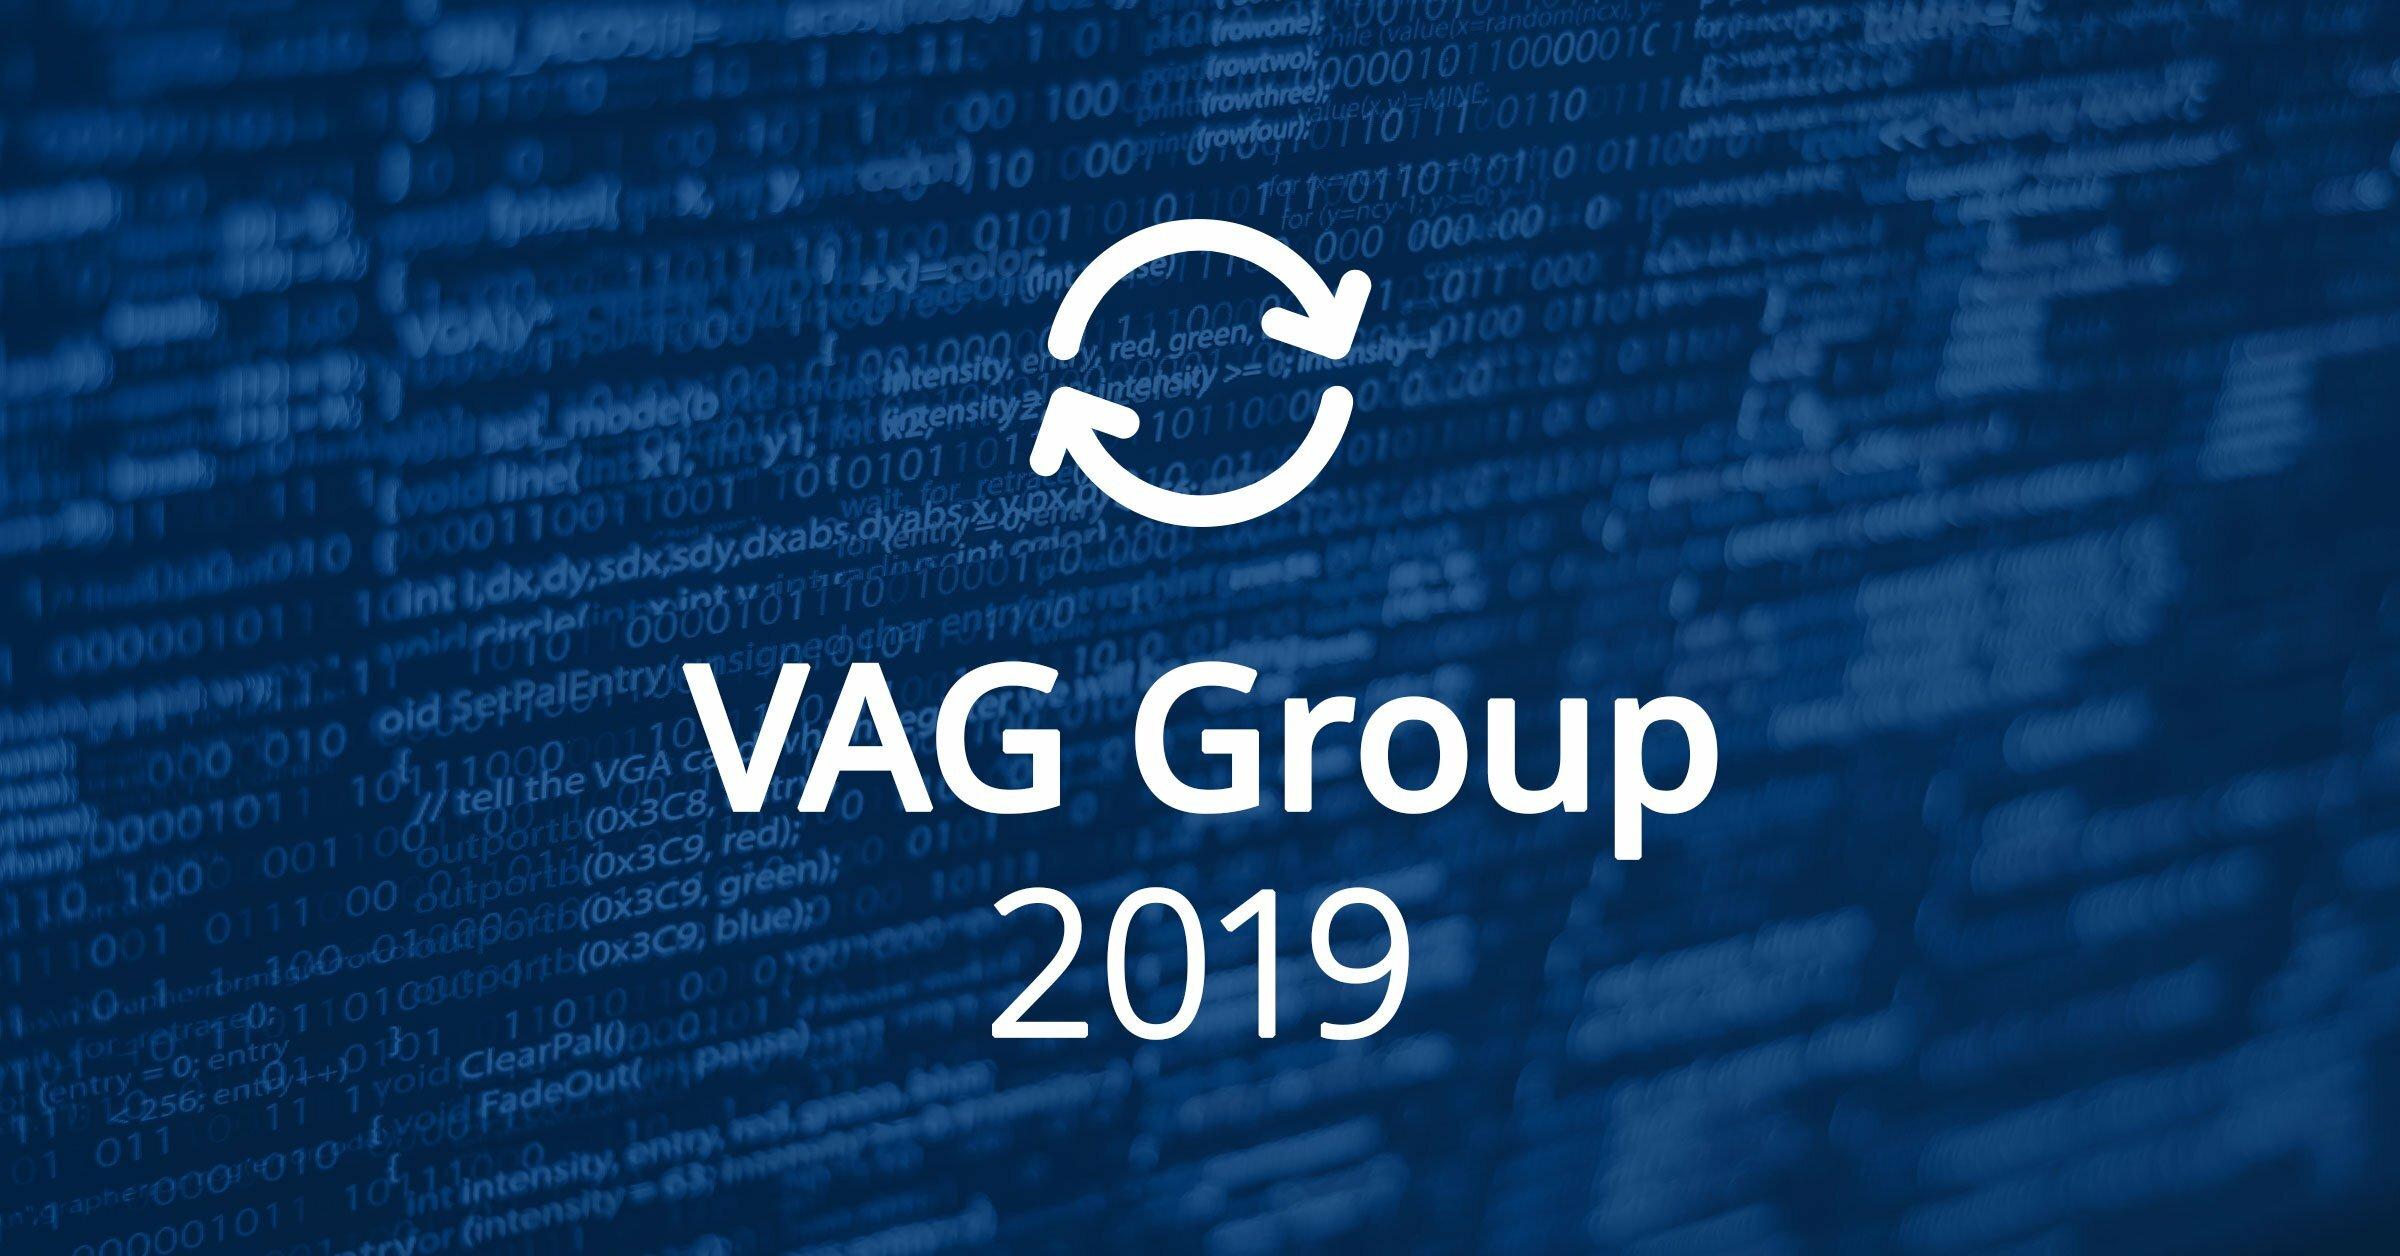 VAG Group Software Updates 2019